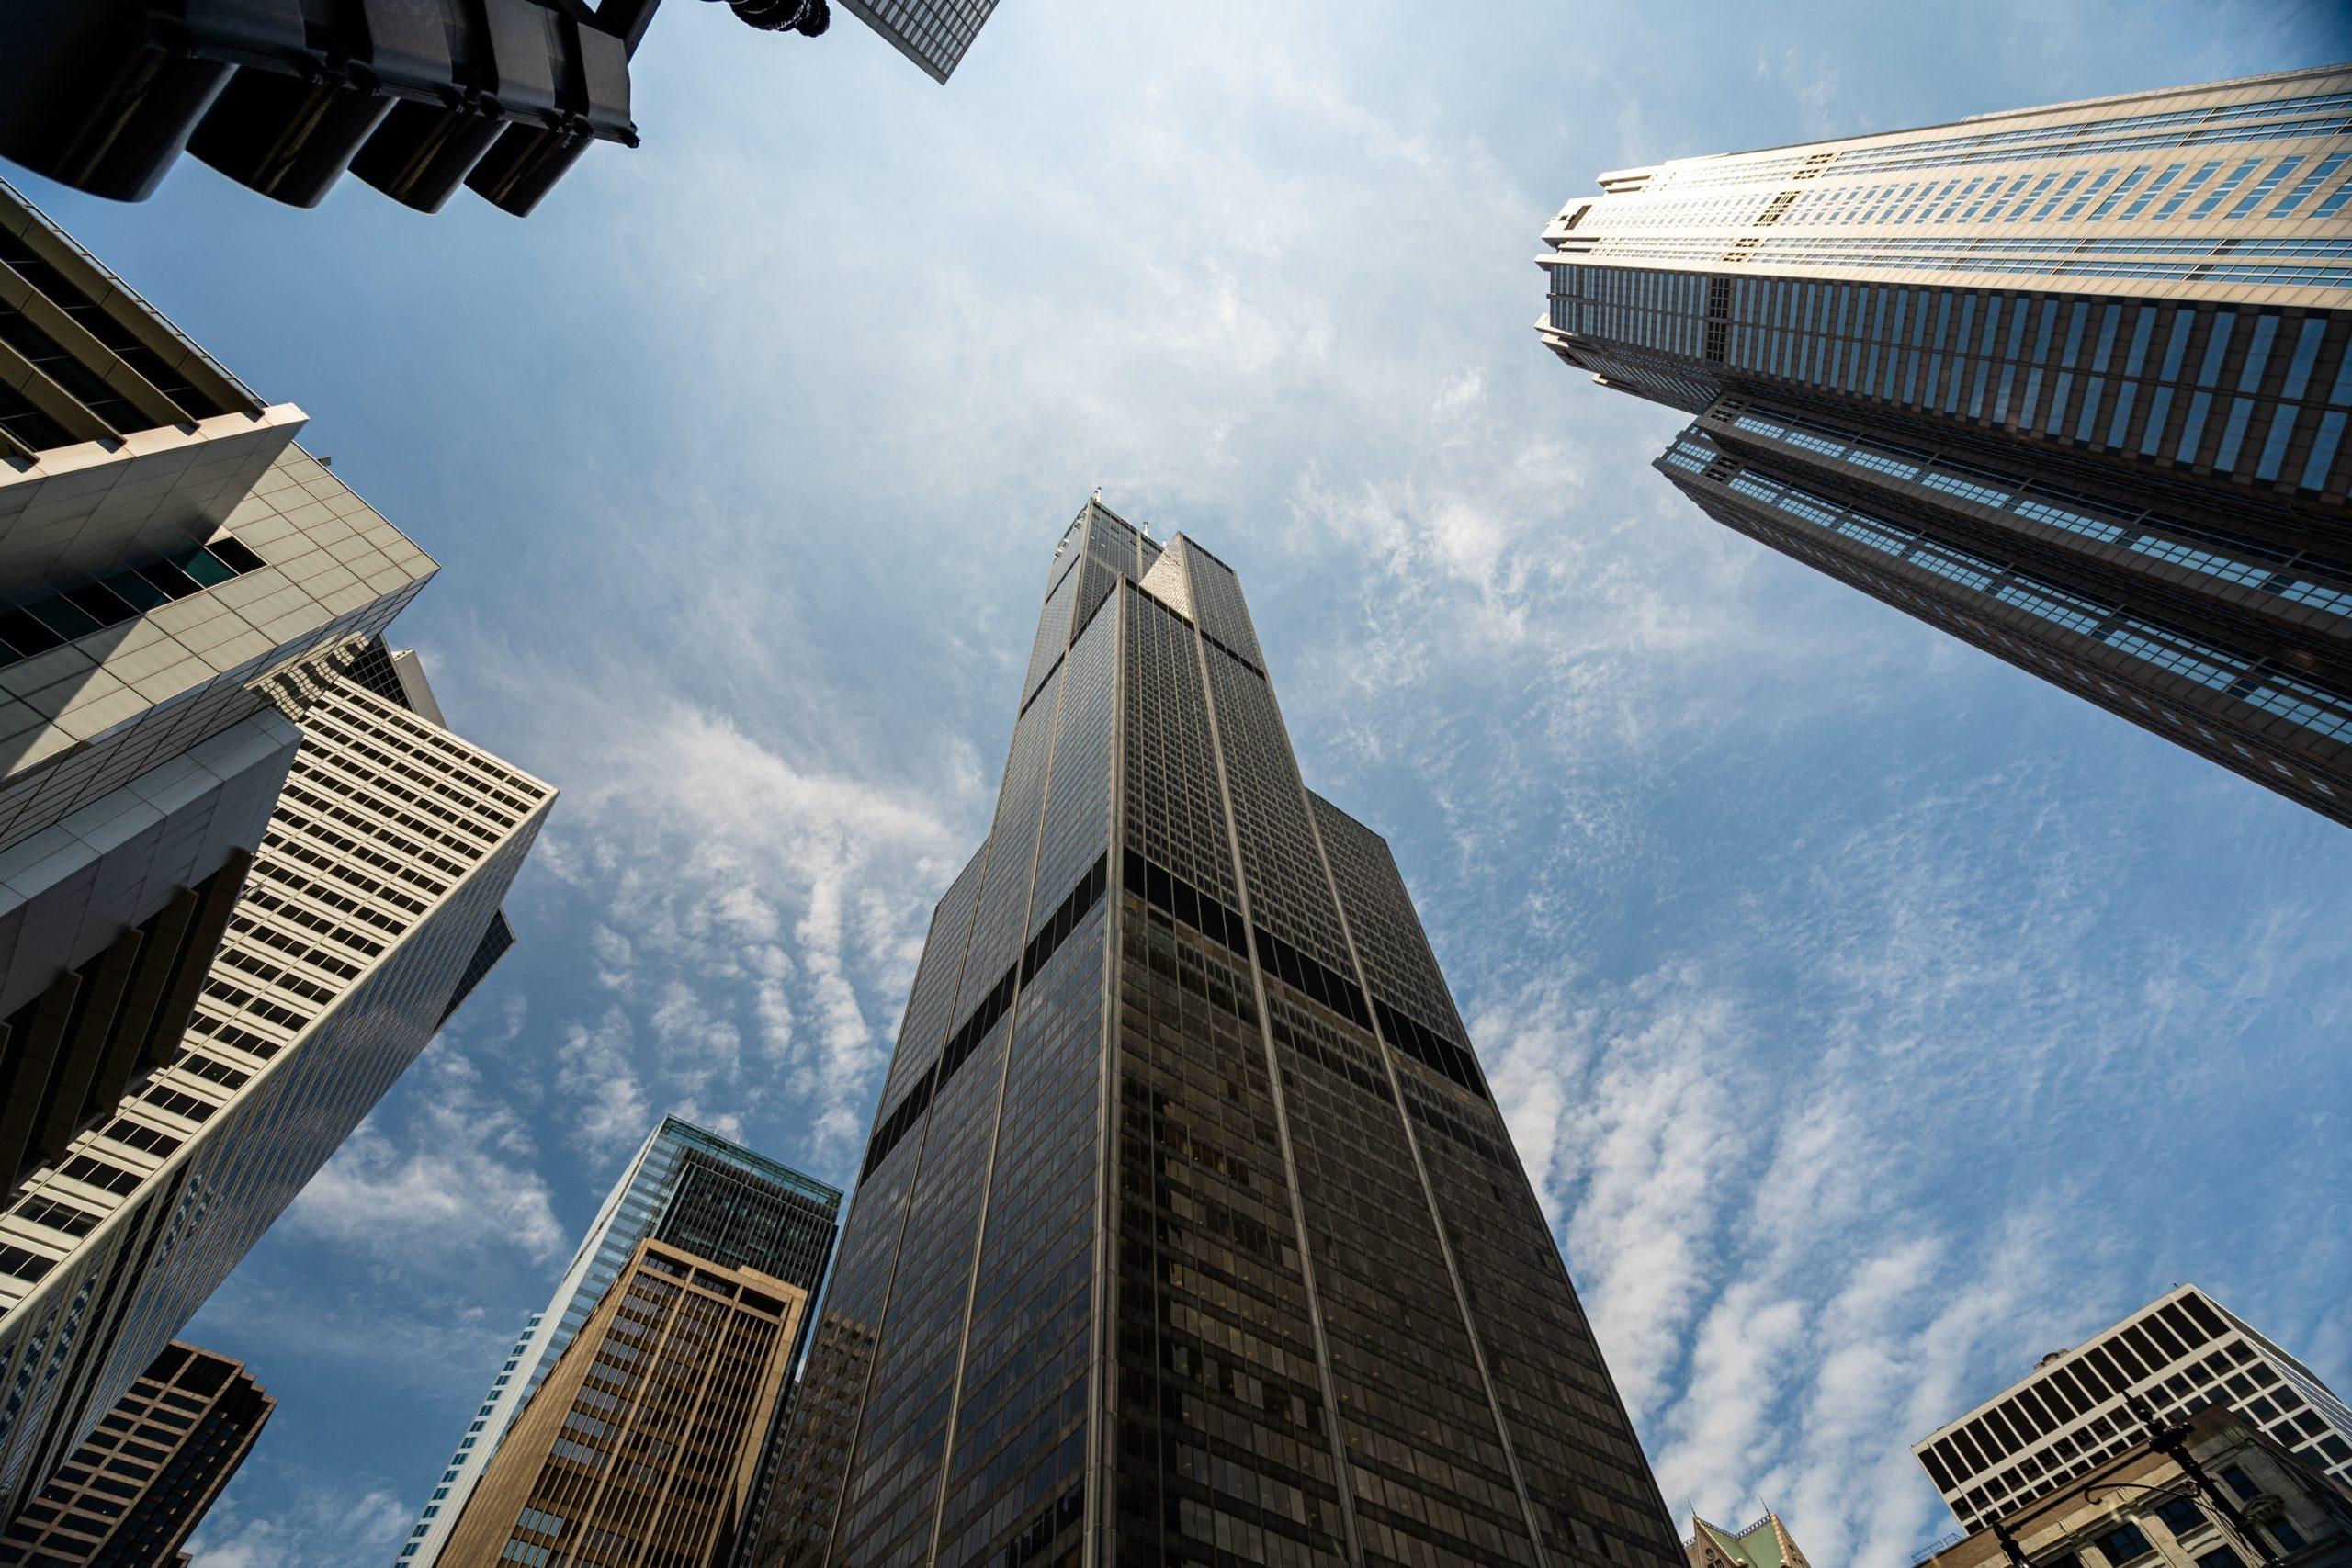 willis-kula-chicago-najgolemite-delovni-zgradi